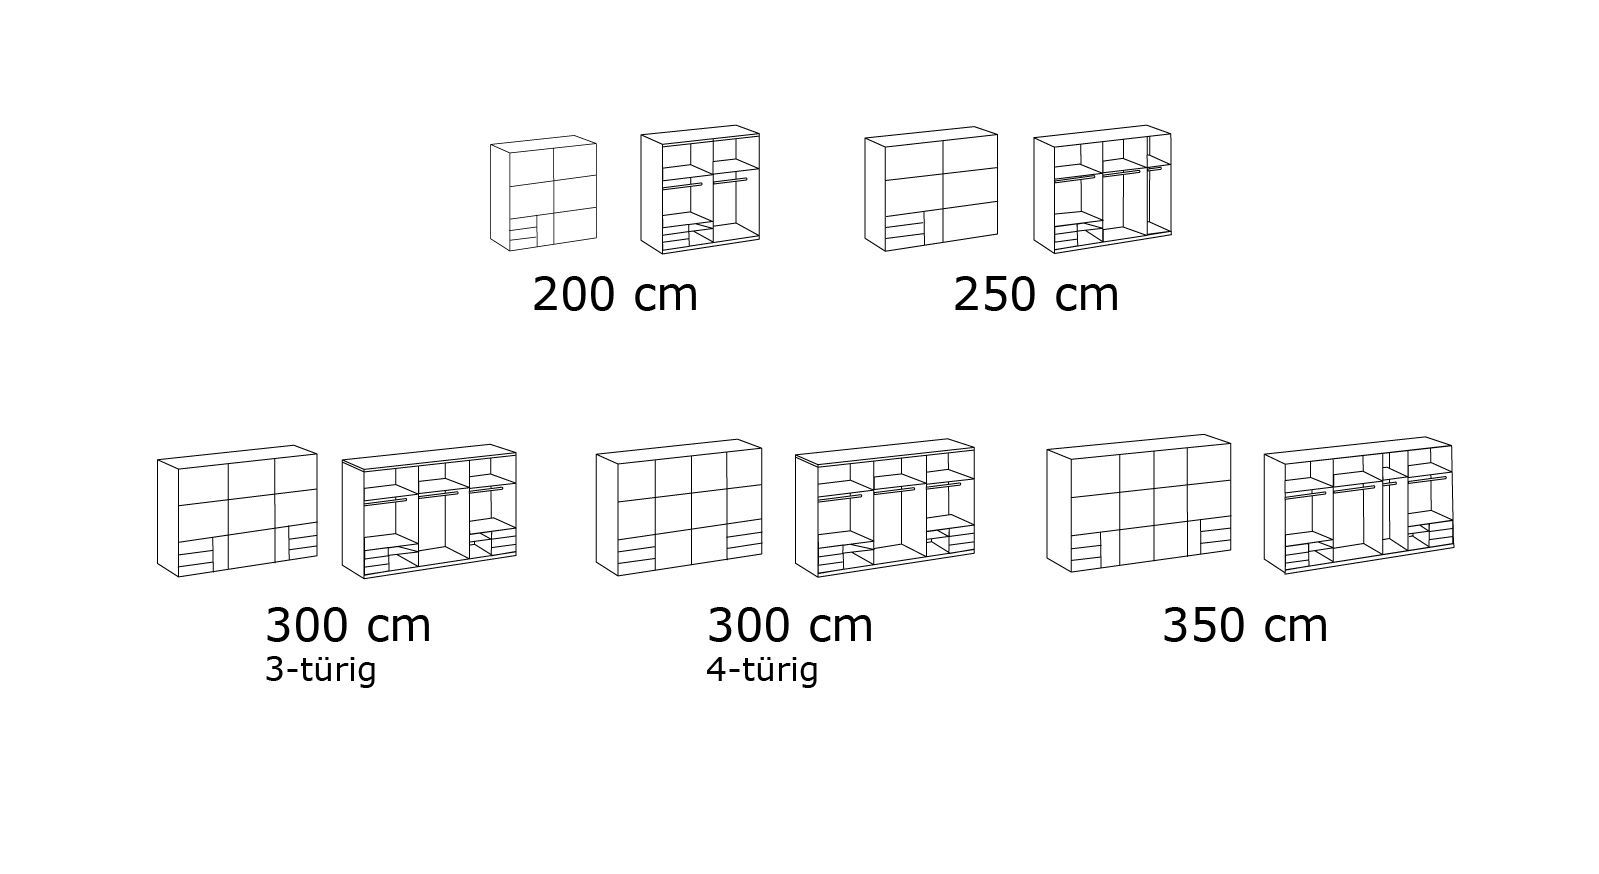 Grafik zum 216 cm hohen Schwebetüren-Kleiderschrank Raca